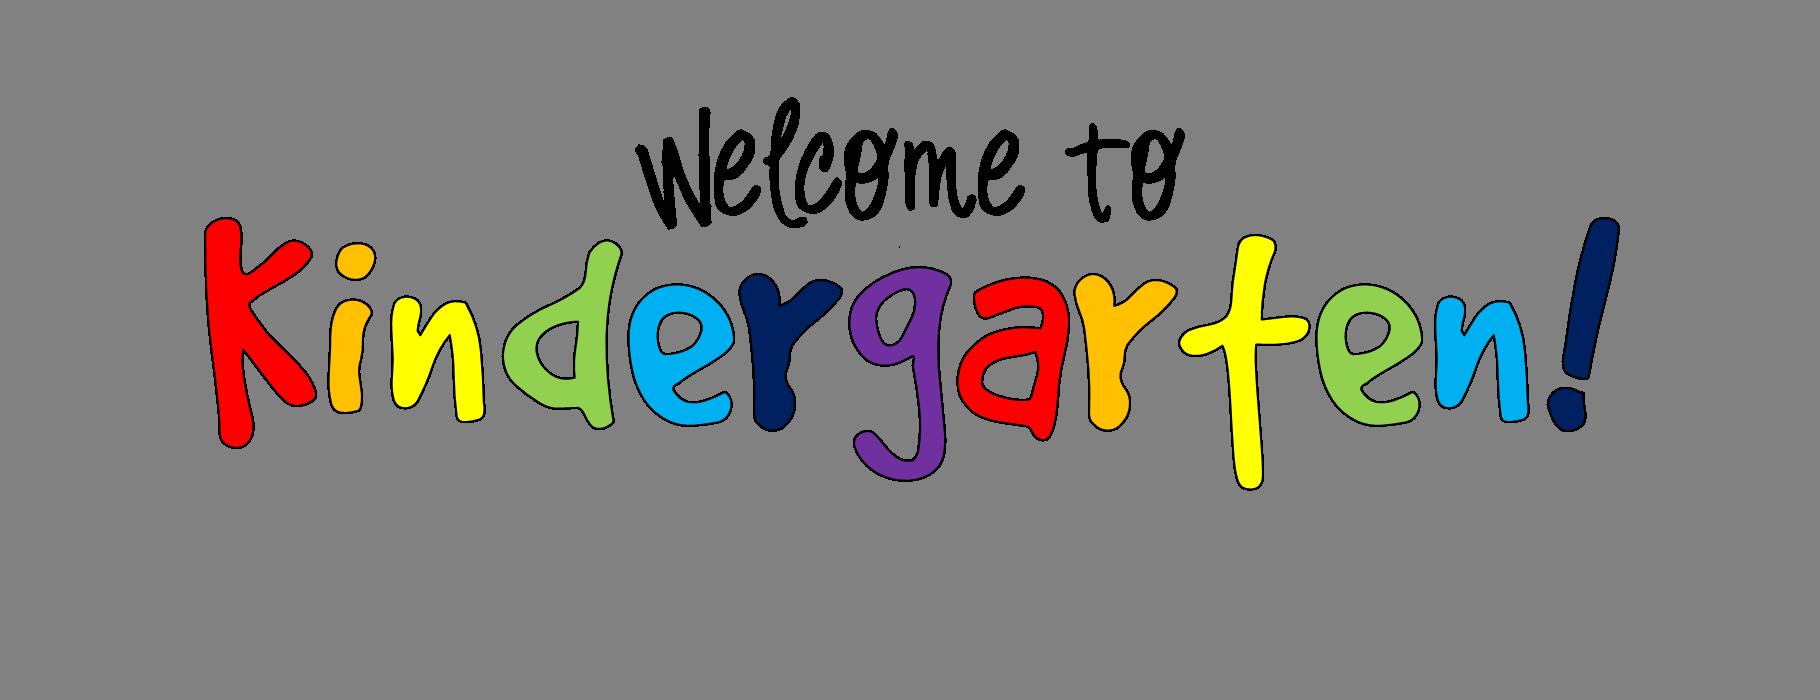 Kindergarten Clip Art Clipart Best-Kindergarten Clip Art Clipart Best-4